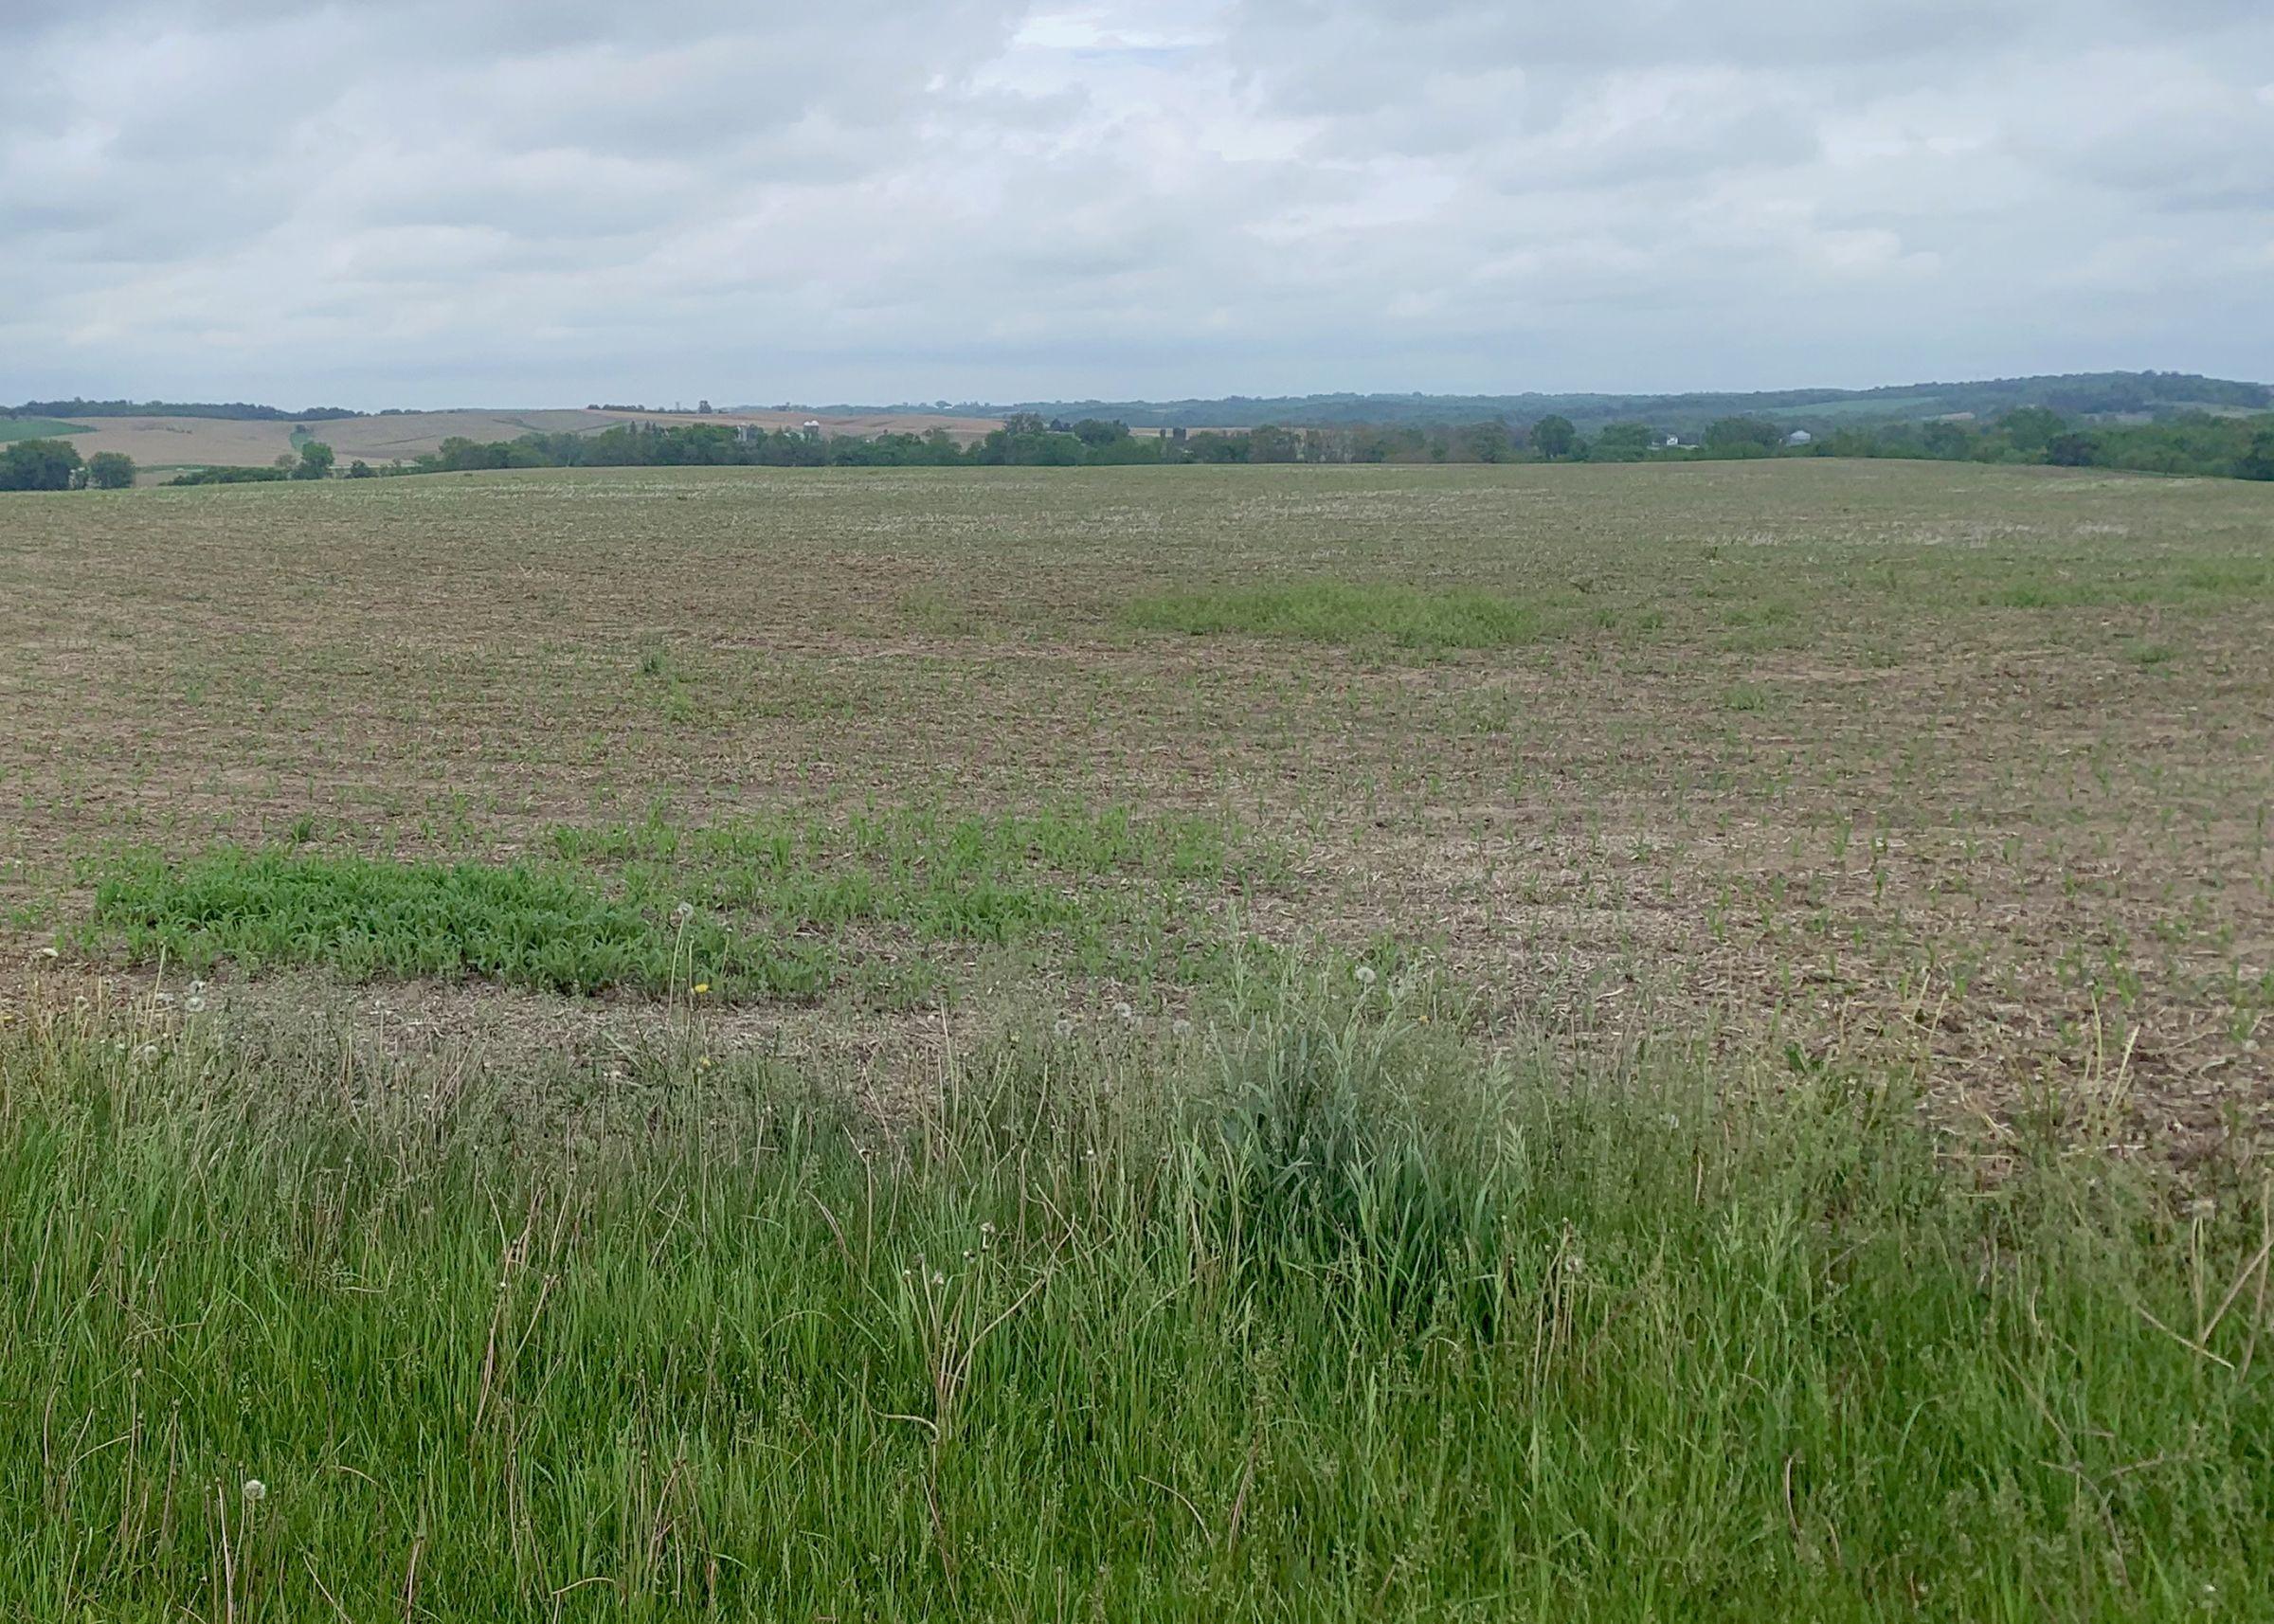 land-jackson-county-iowa-42-acres-listing-number-15535-3-2021-05-27-193622.jpg